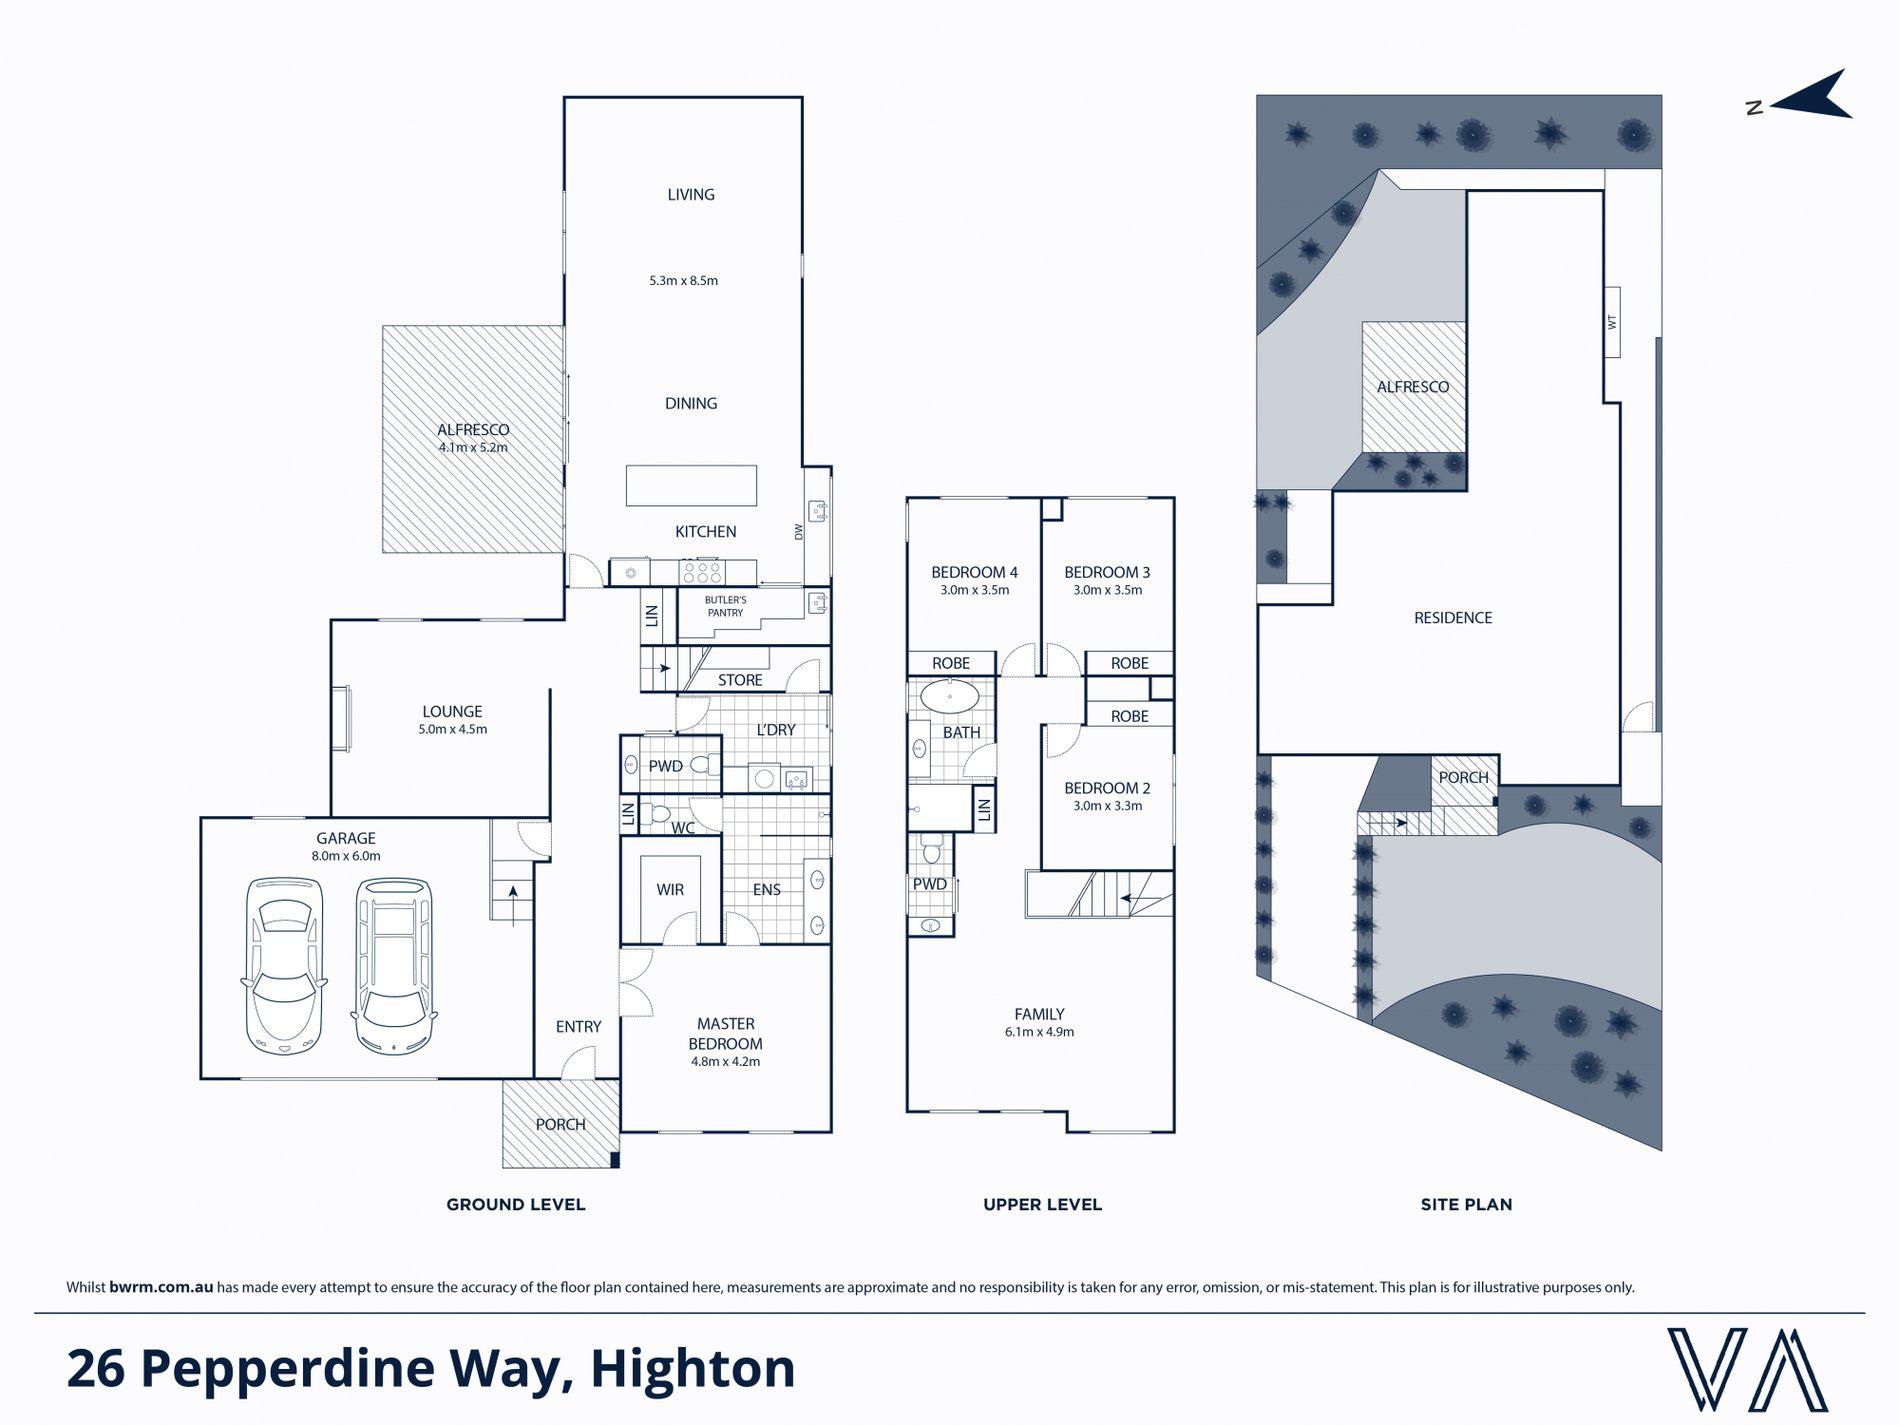 26 Pepperdine Way, Highton